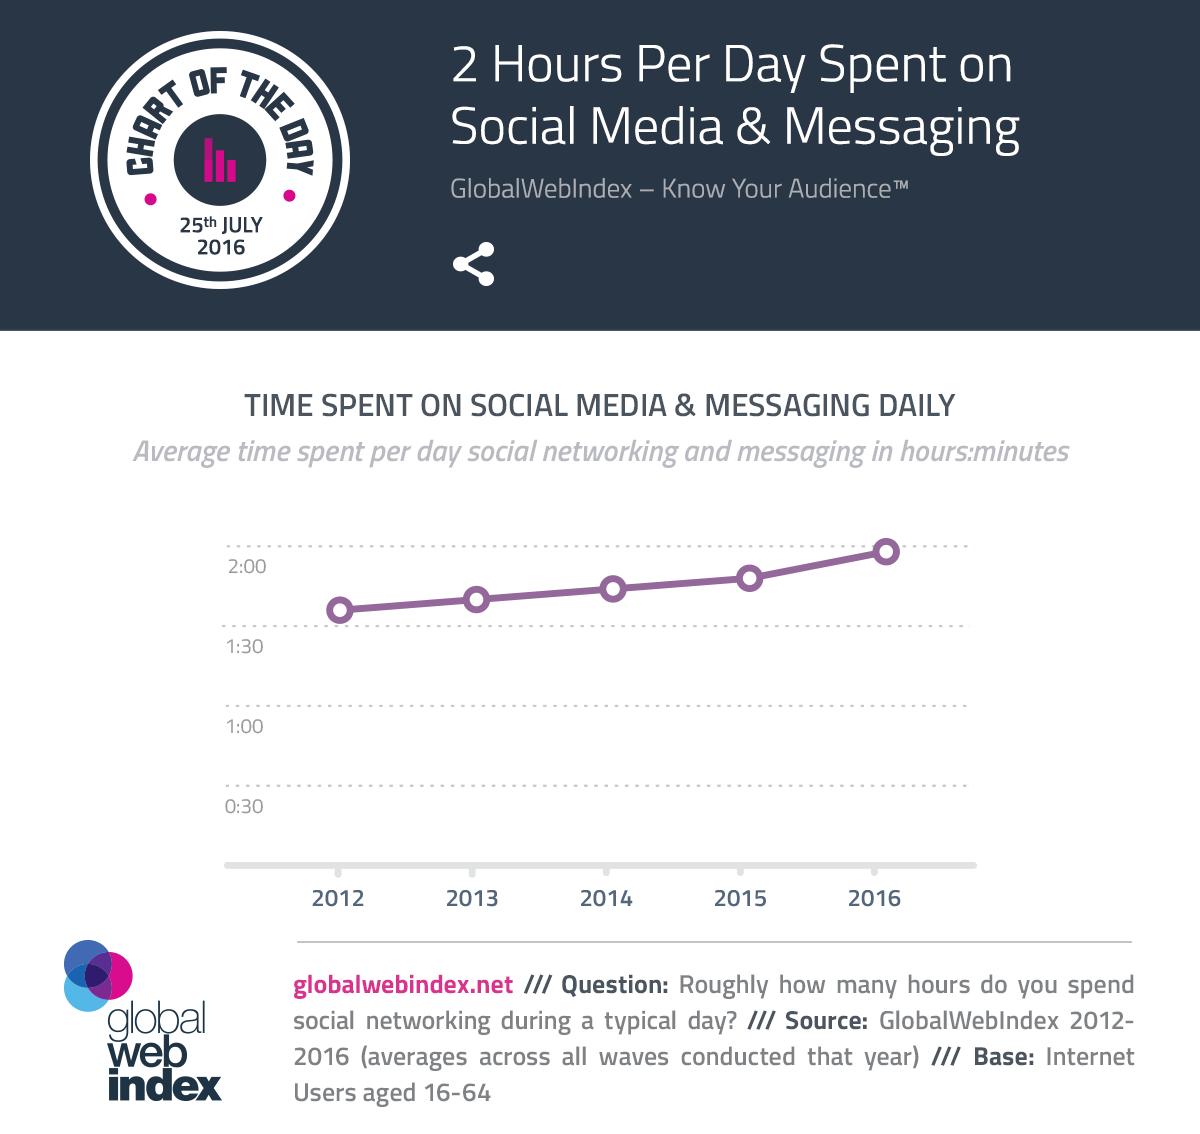 2 Hours Per Day Spent on Social Media & Messaging